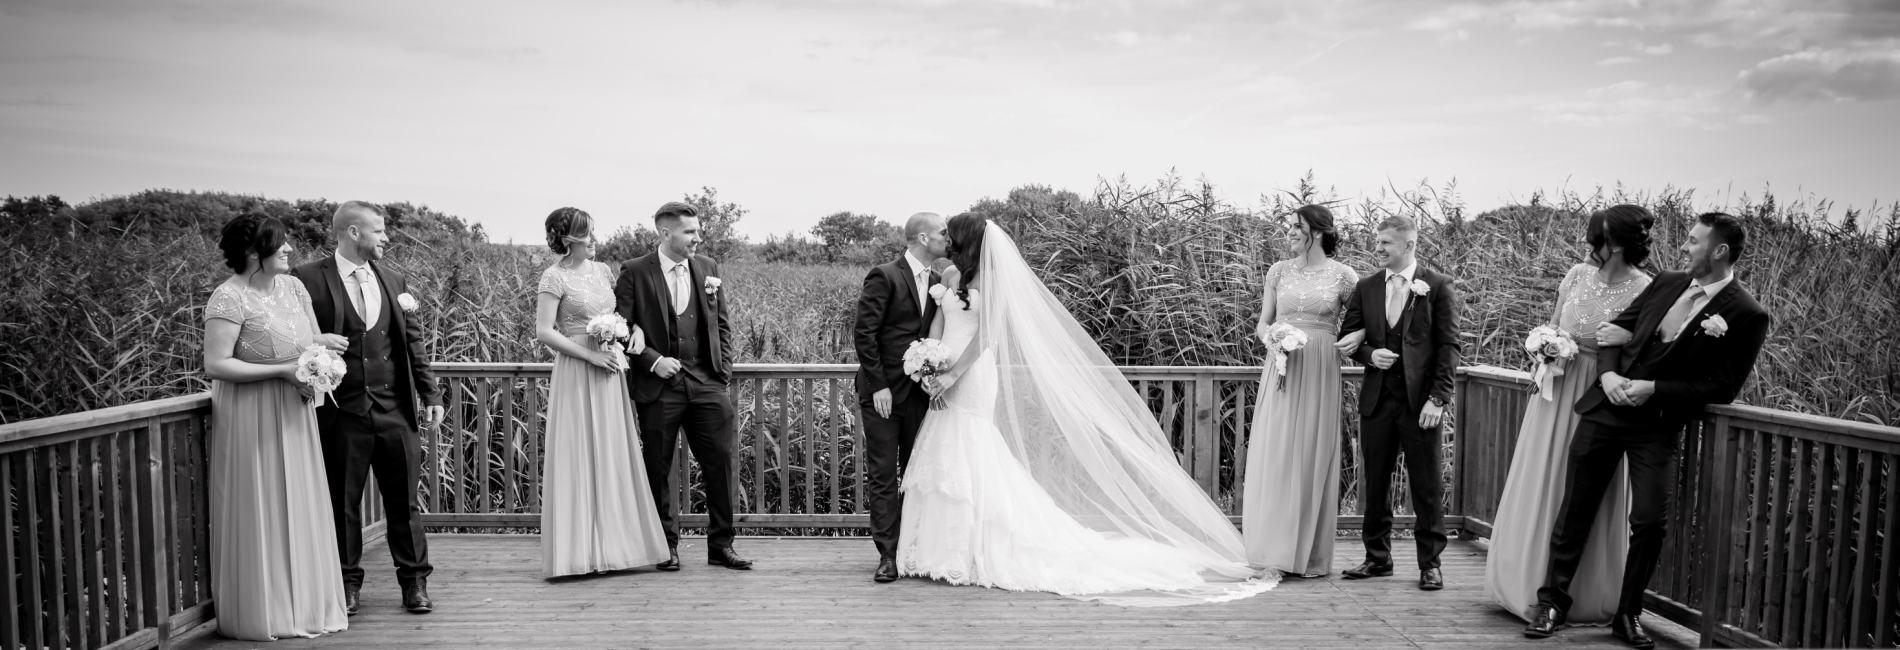 Arklow Bay Hotel Wicklow wedding group on decking